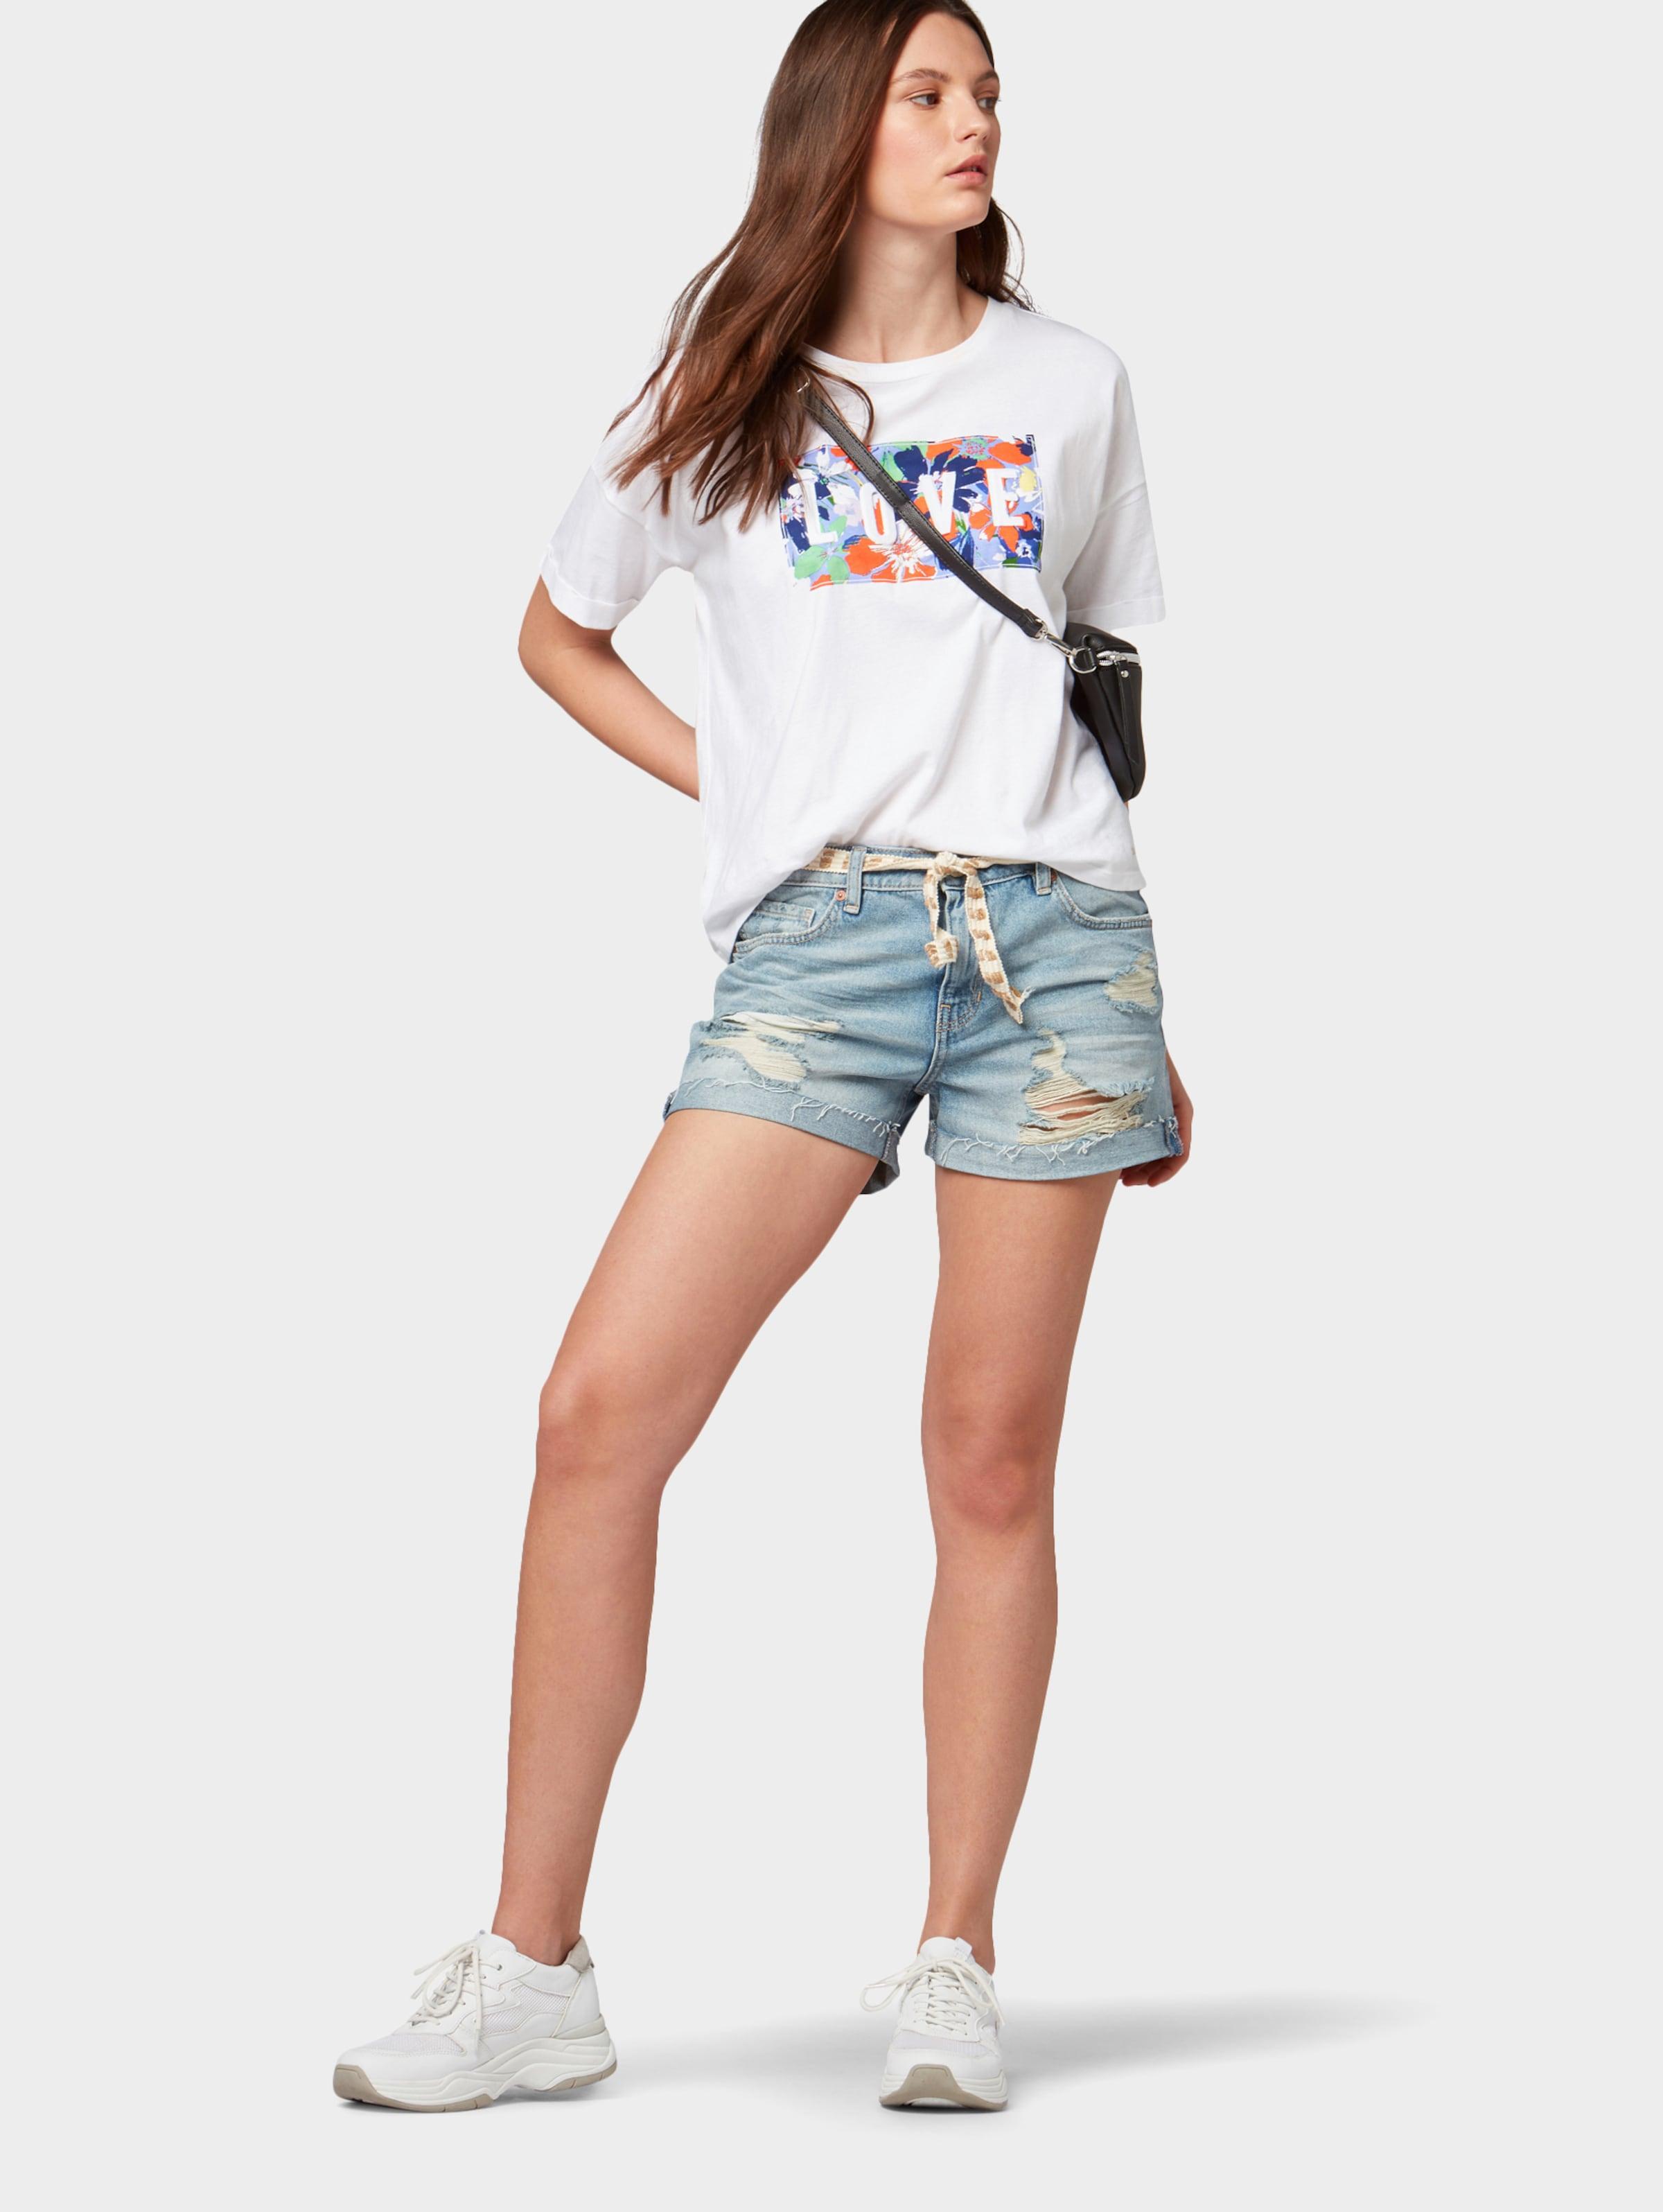 In Shorts Denim Tailor Hellblau Tom vbY76gfy